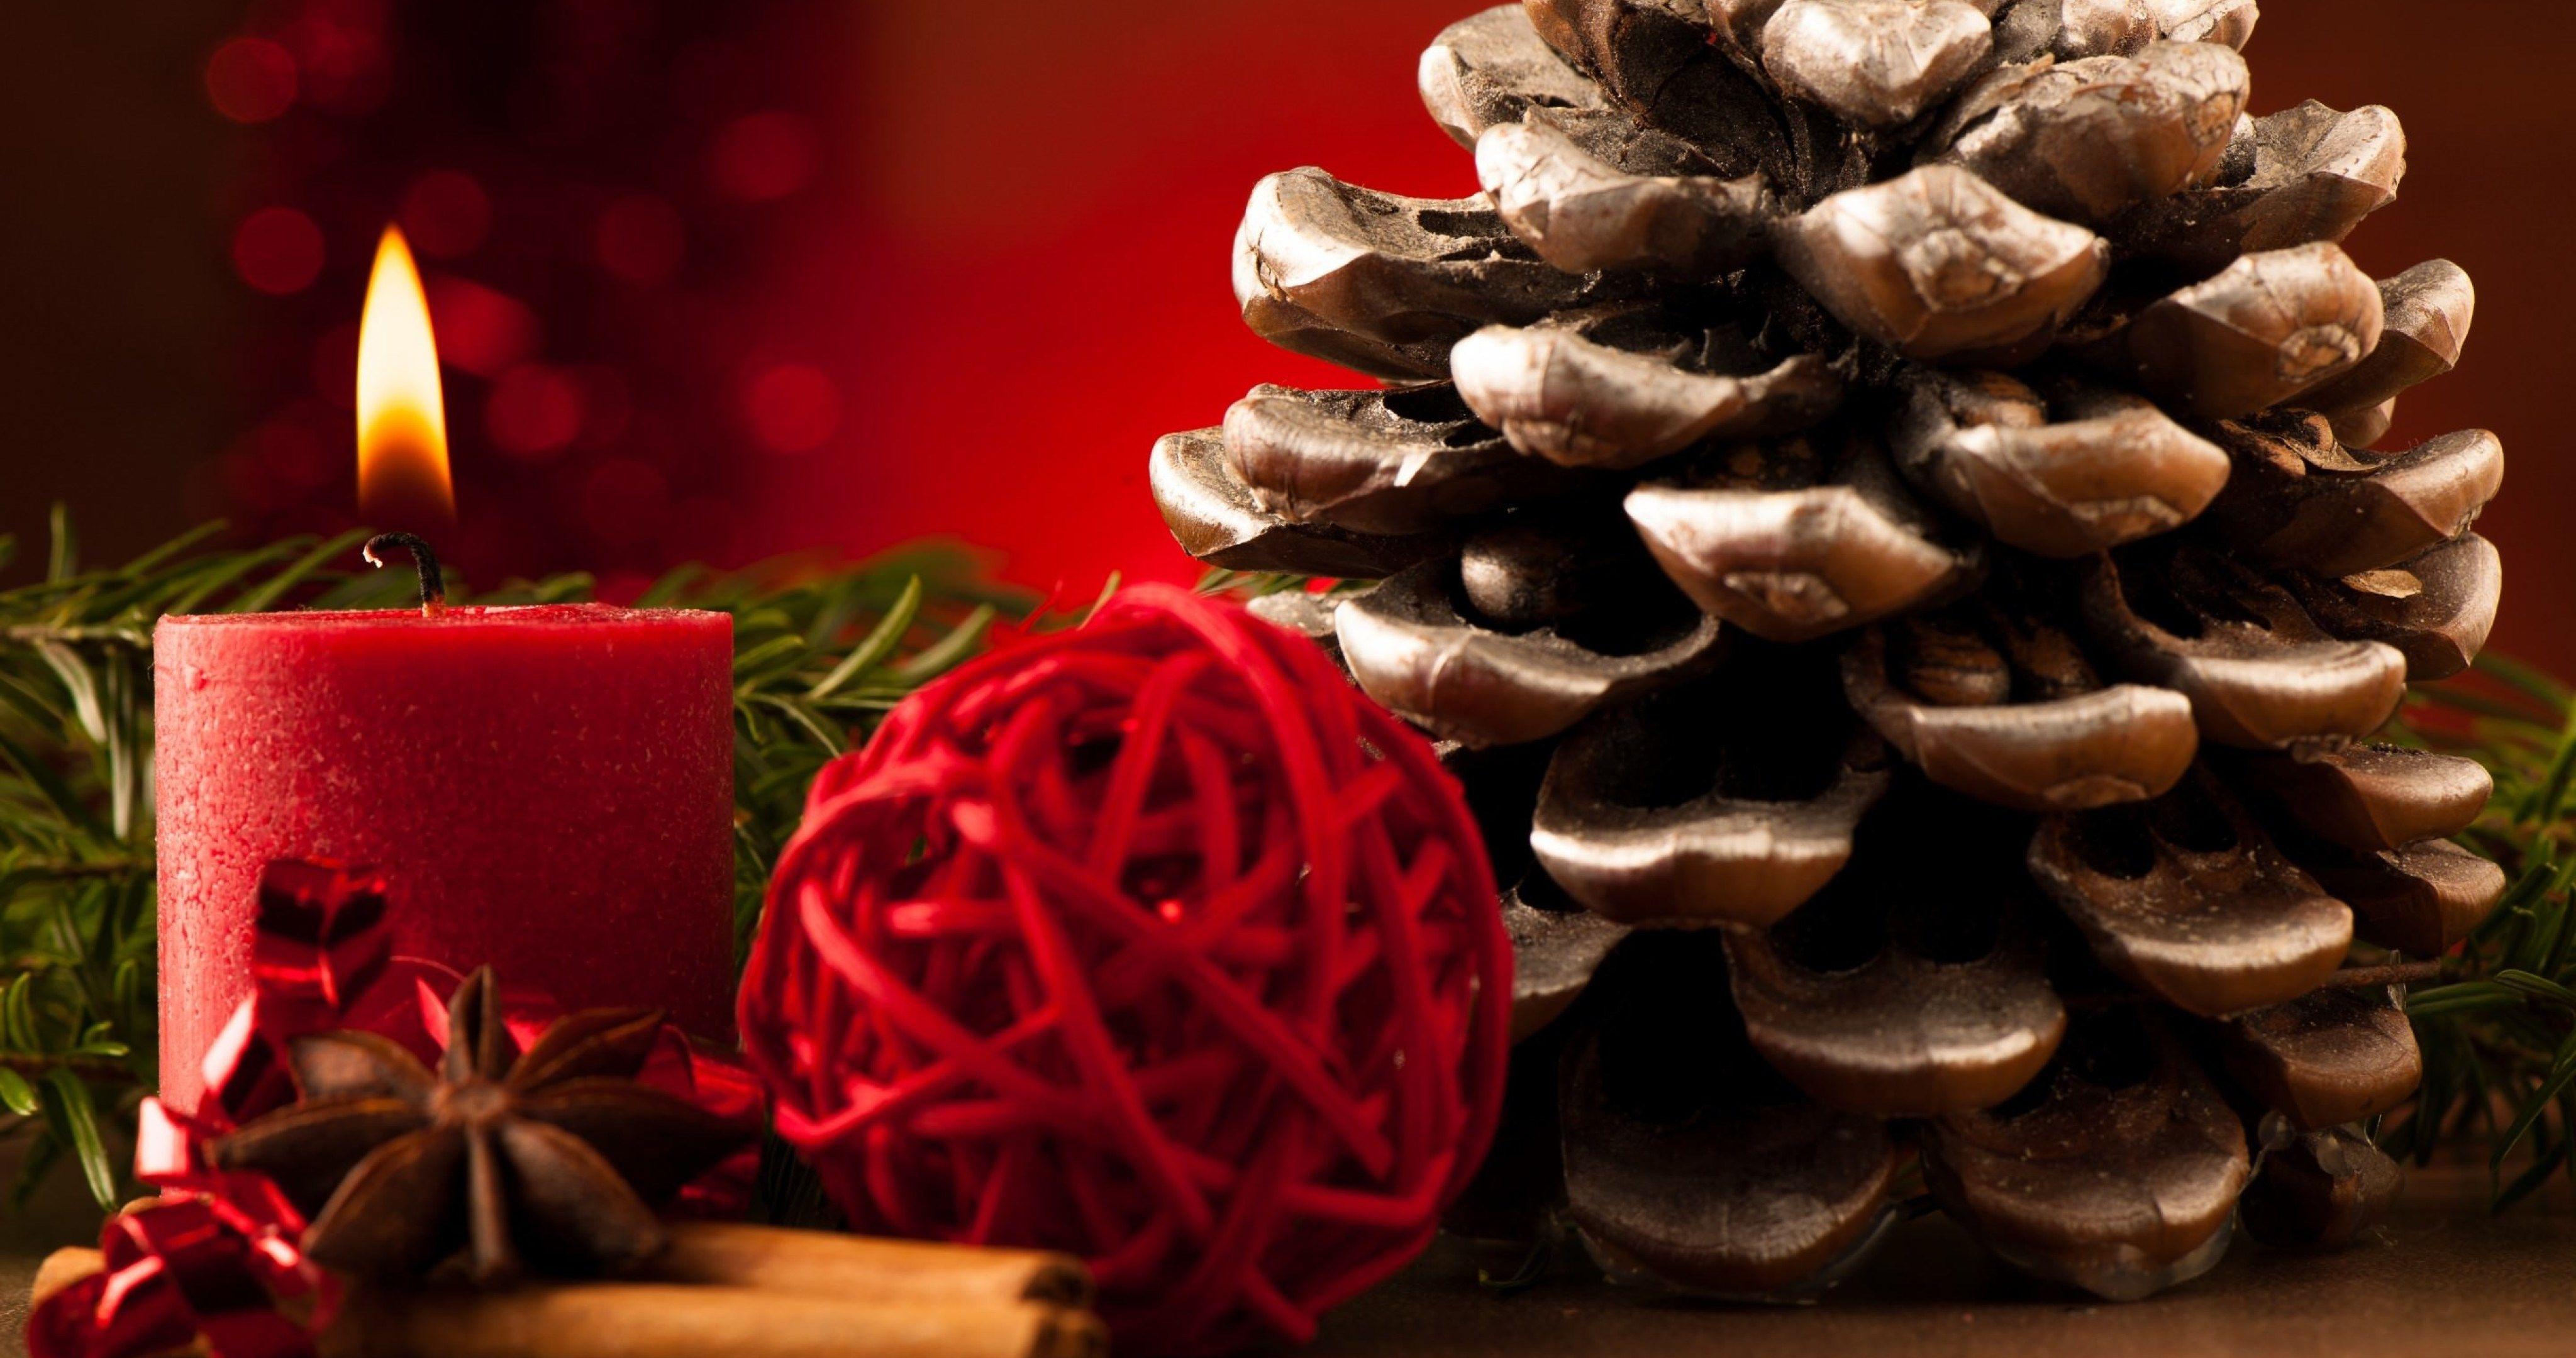 4K Ultra HD Christmas Wallpapers - Top Free 4K Ultra HD ...